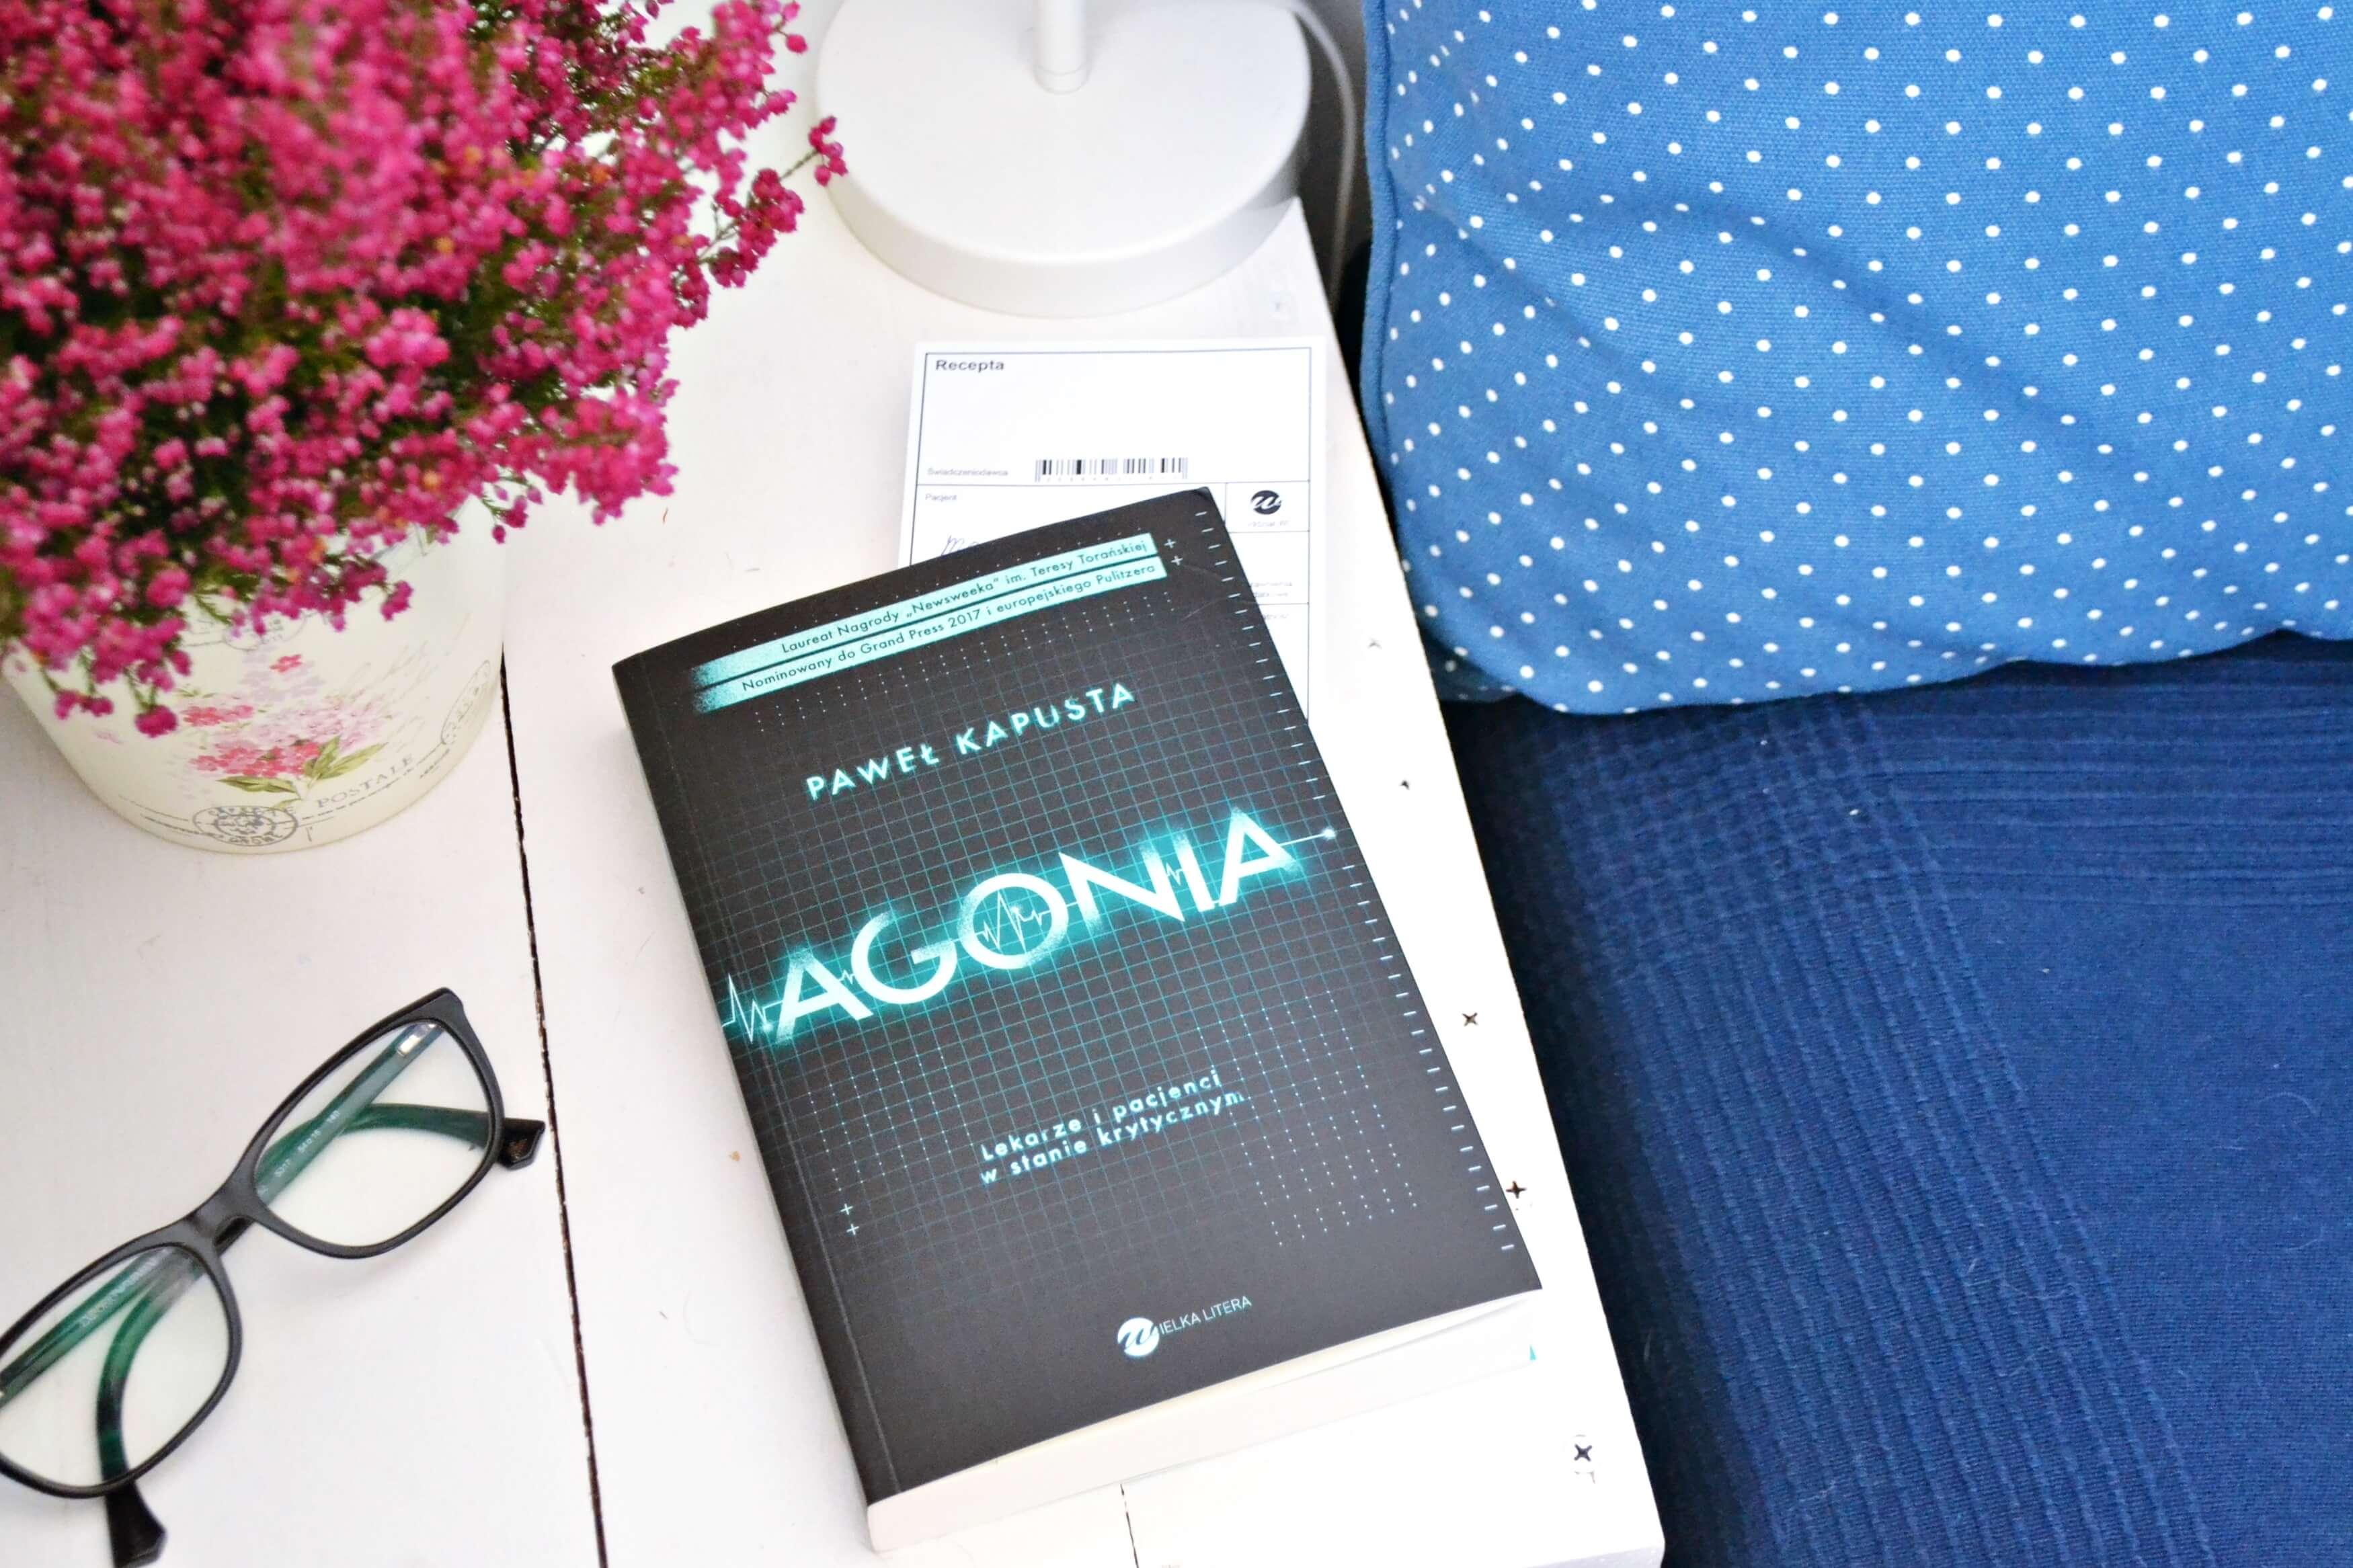 Agonia - Paweł Kapusta